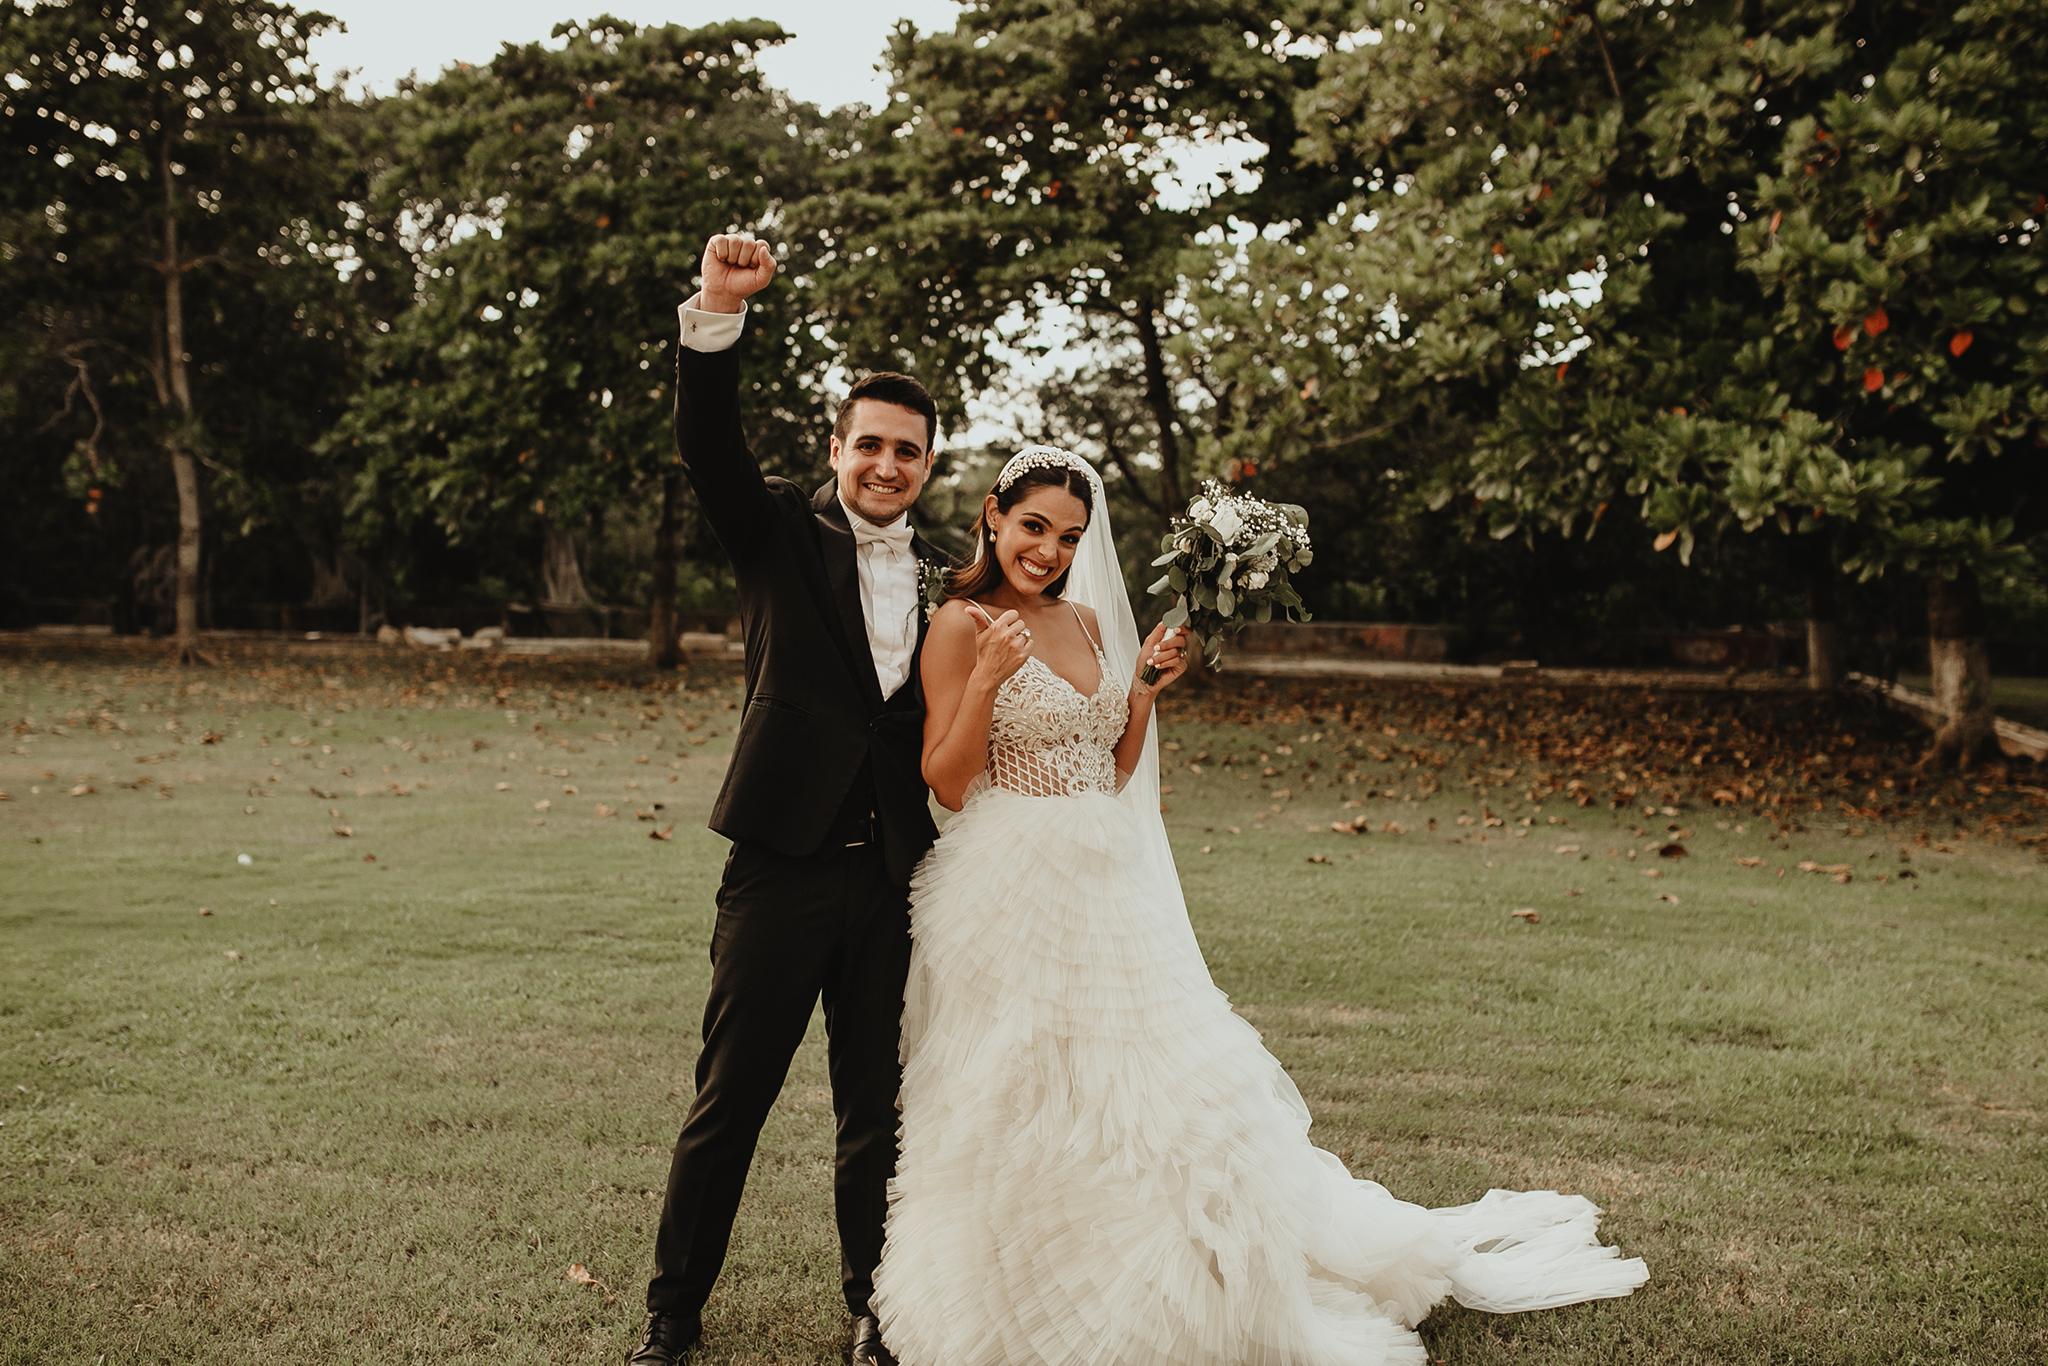 0842R&F__WeddingDestination_Weddingmerida_BodaMexico_FotografoDeBodas_FabrizioSimoneenFotografo.jpg